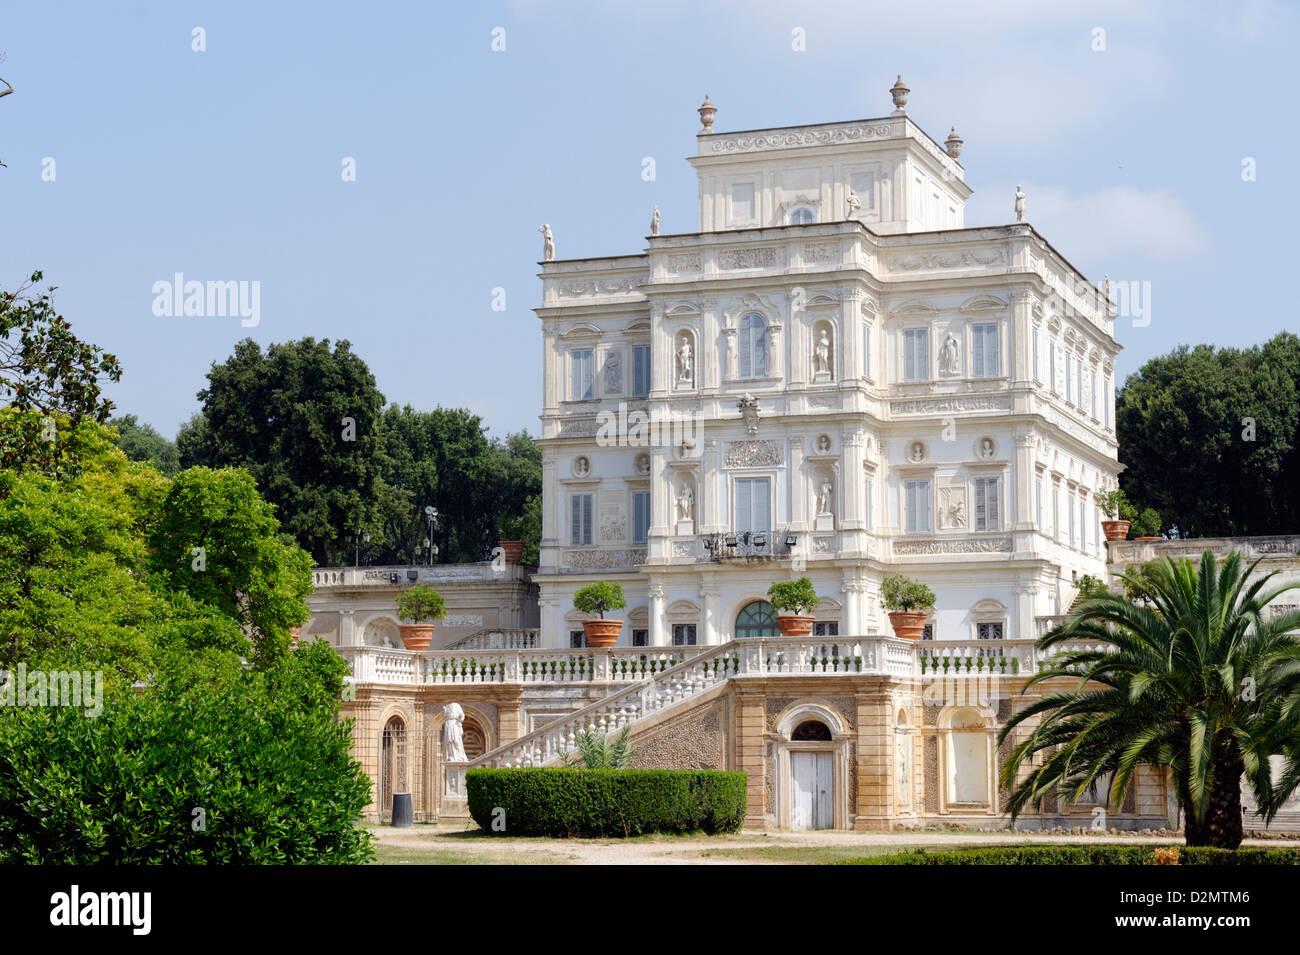 Casinos near rome italy online casinos accepting western union